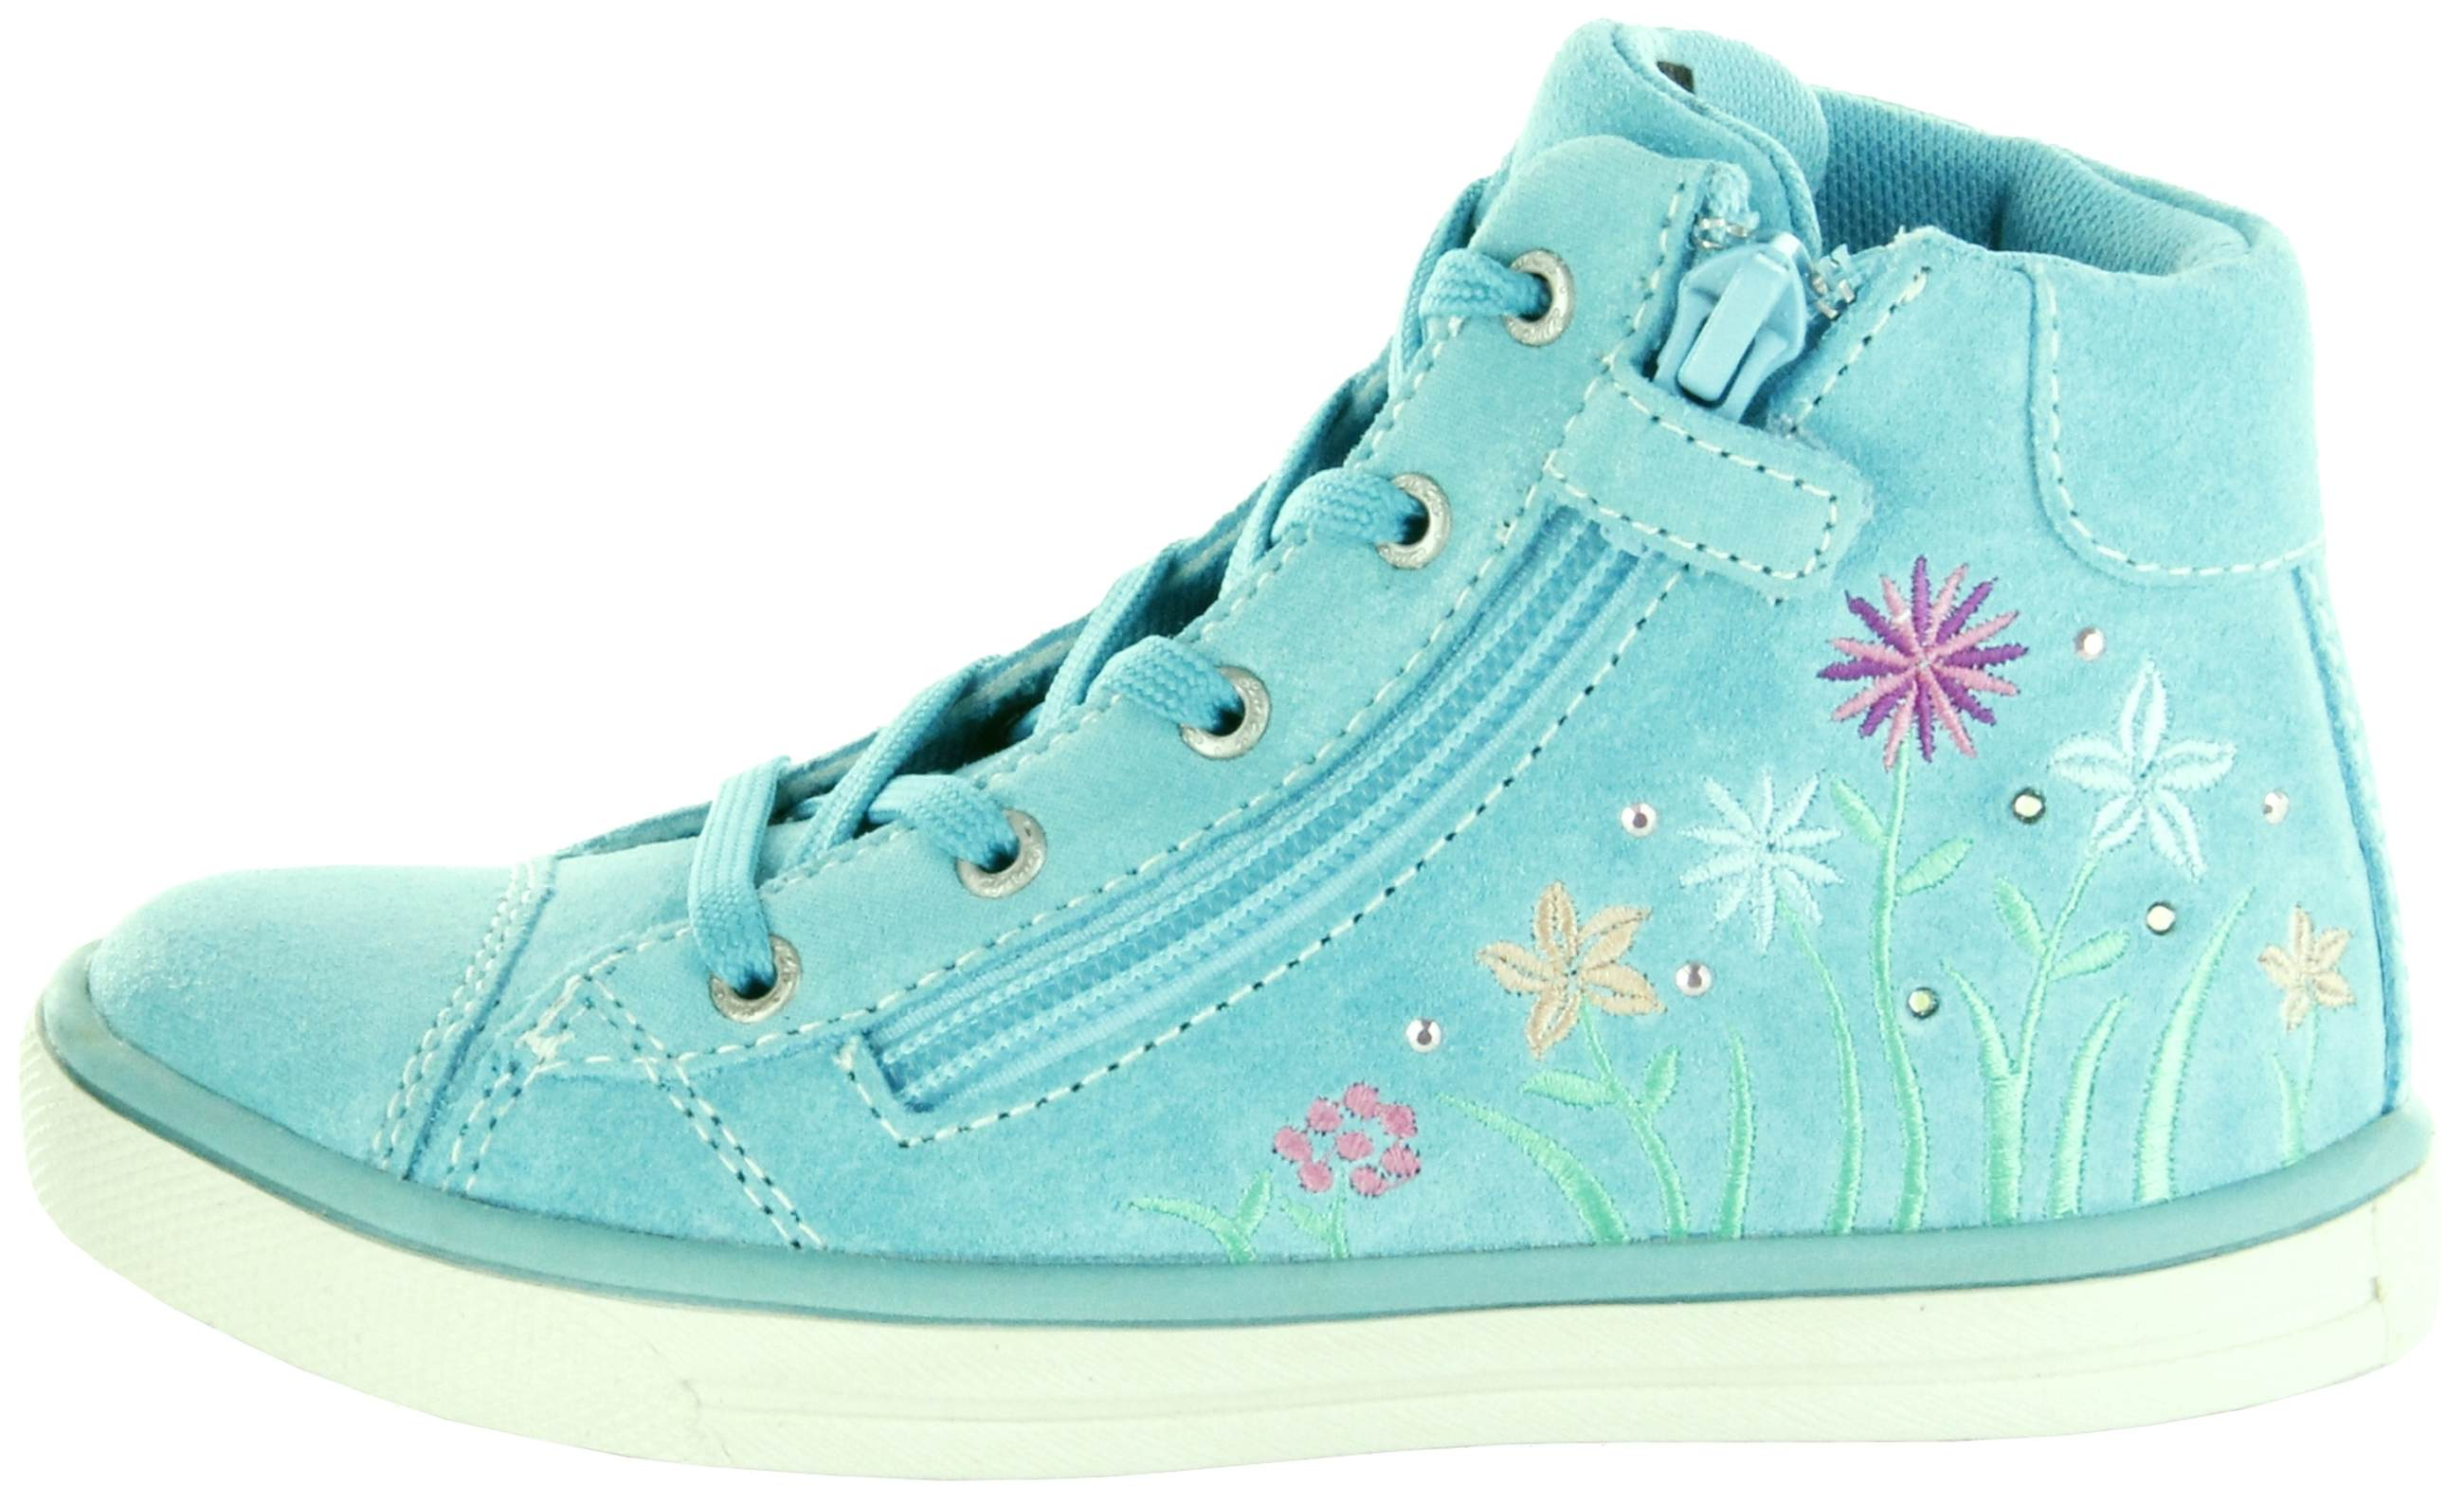 san francisco a48d8 a1360 Lurchi Kinder Halbschuhe Sneaker Blinki türkis Velourleder Mädchen Schuhe  33-13640-29 Aqua Summi